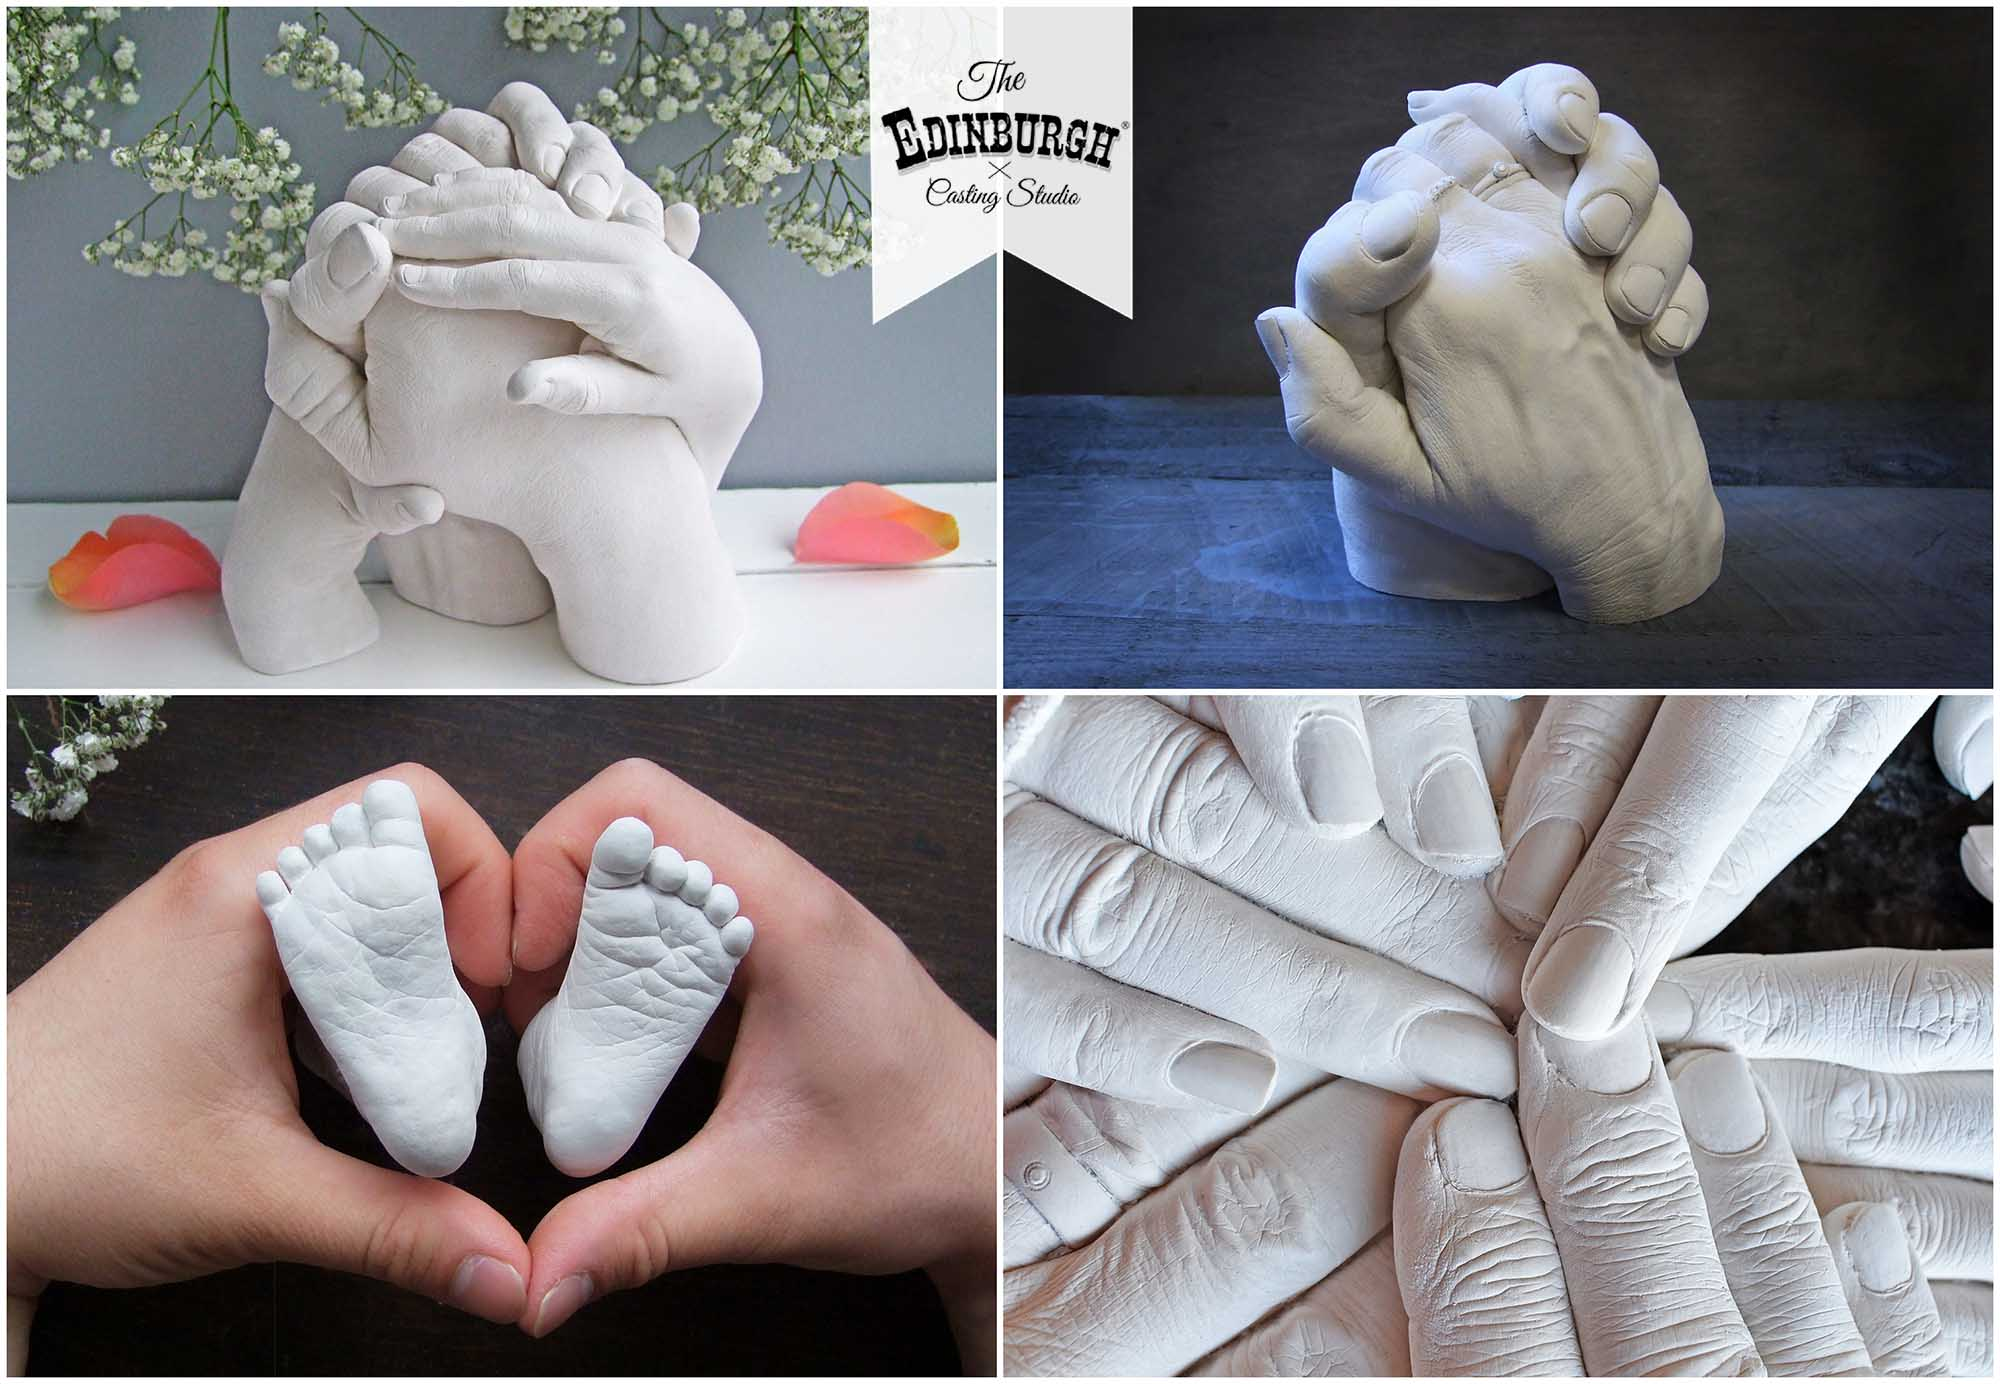 the-edinburgh-studios-hand-casting-kits.jpg